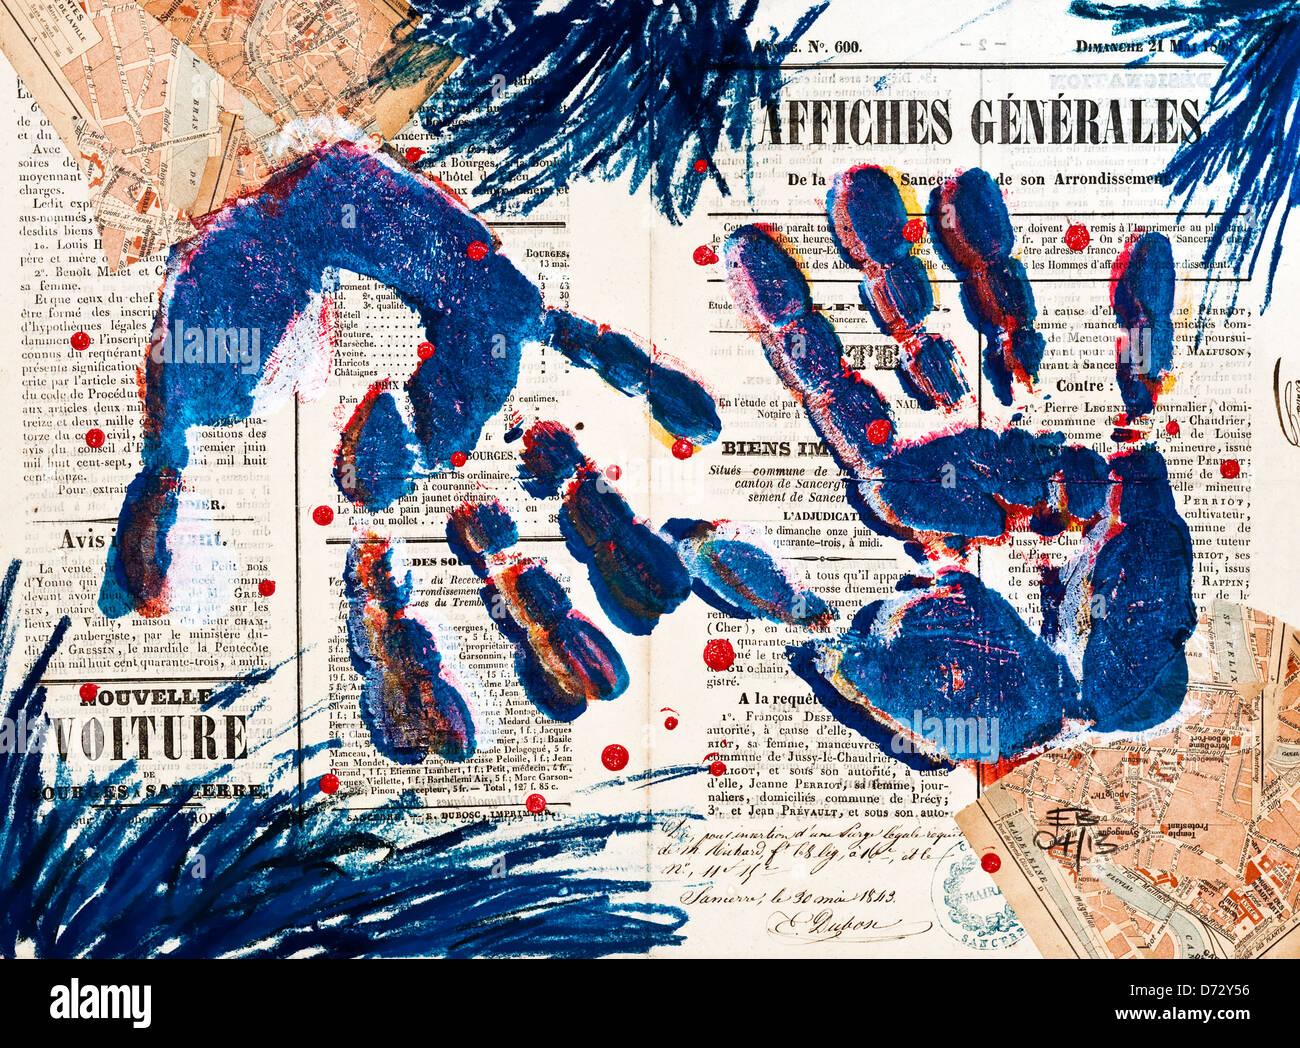 'Hands' pastel abstrait collage / dessin illustration - Illustration de Ed Buziak. Photo Stock